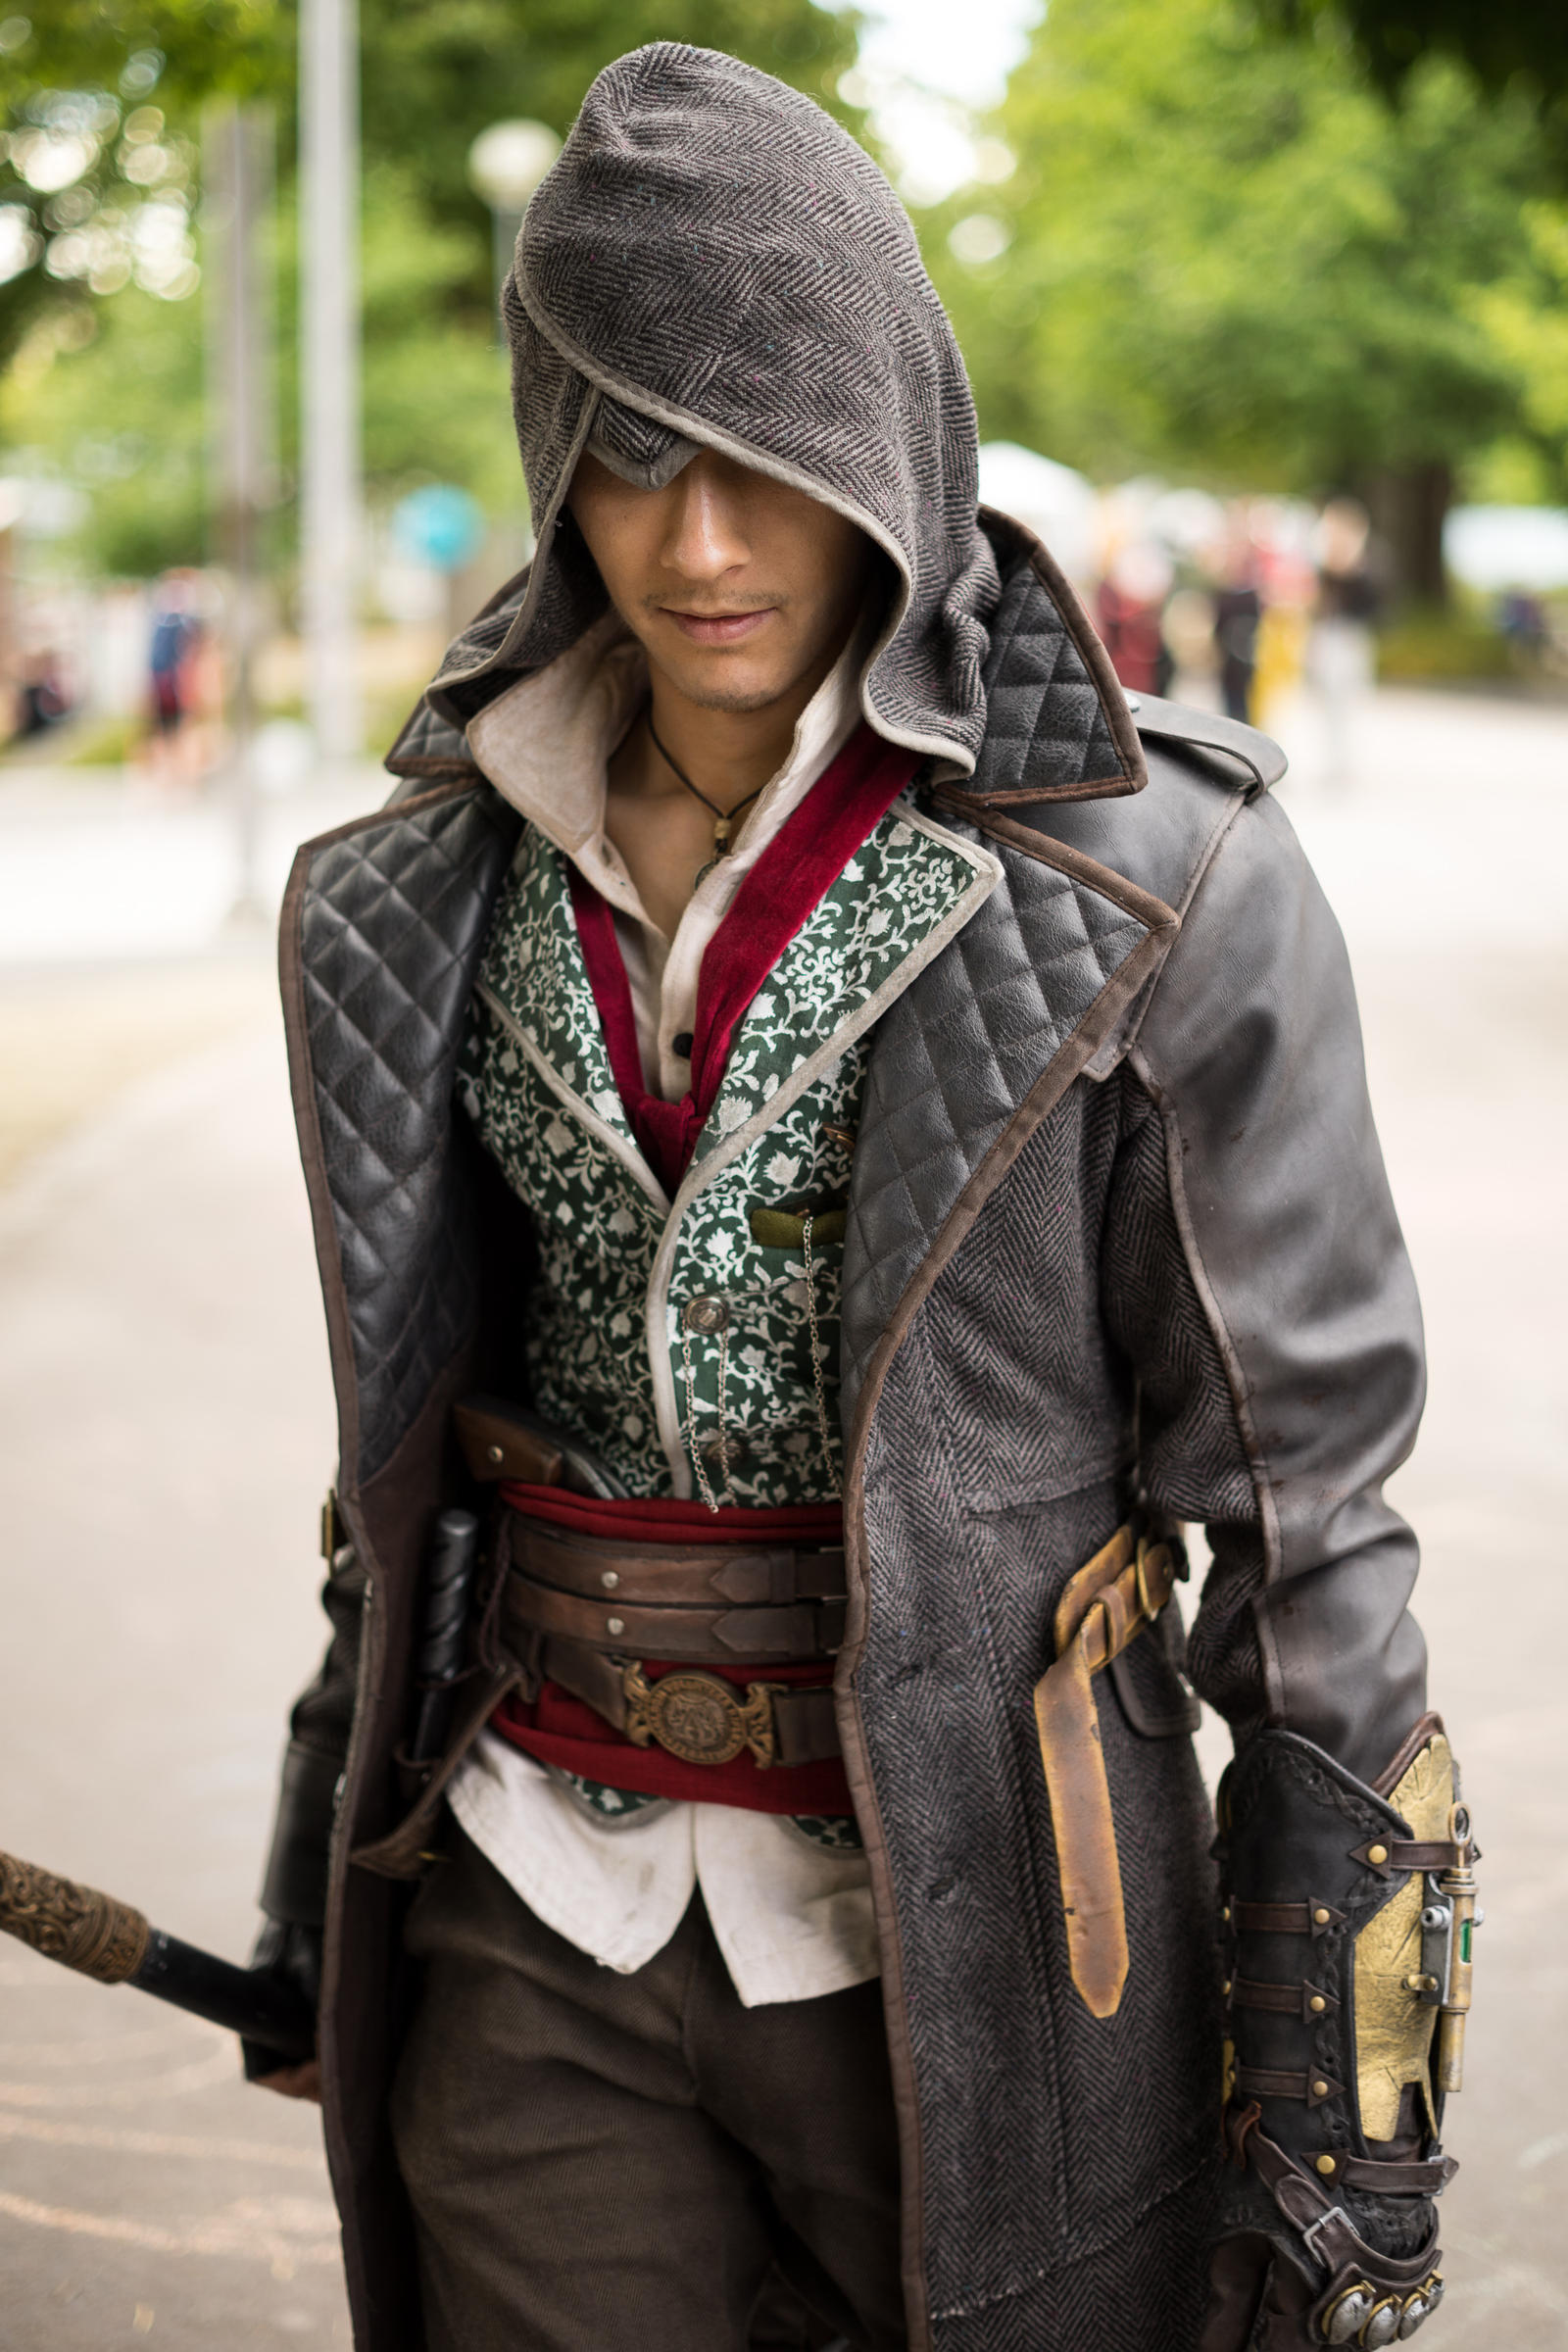 Jacob Frye/Gallery | Assassin&#39-s Creed Wiki | FANDOM powered by Wikia